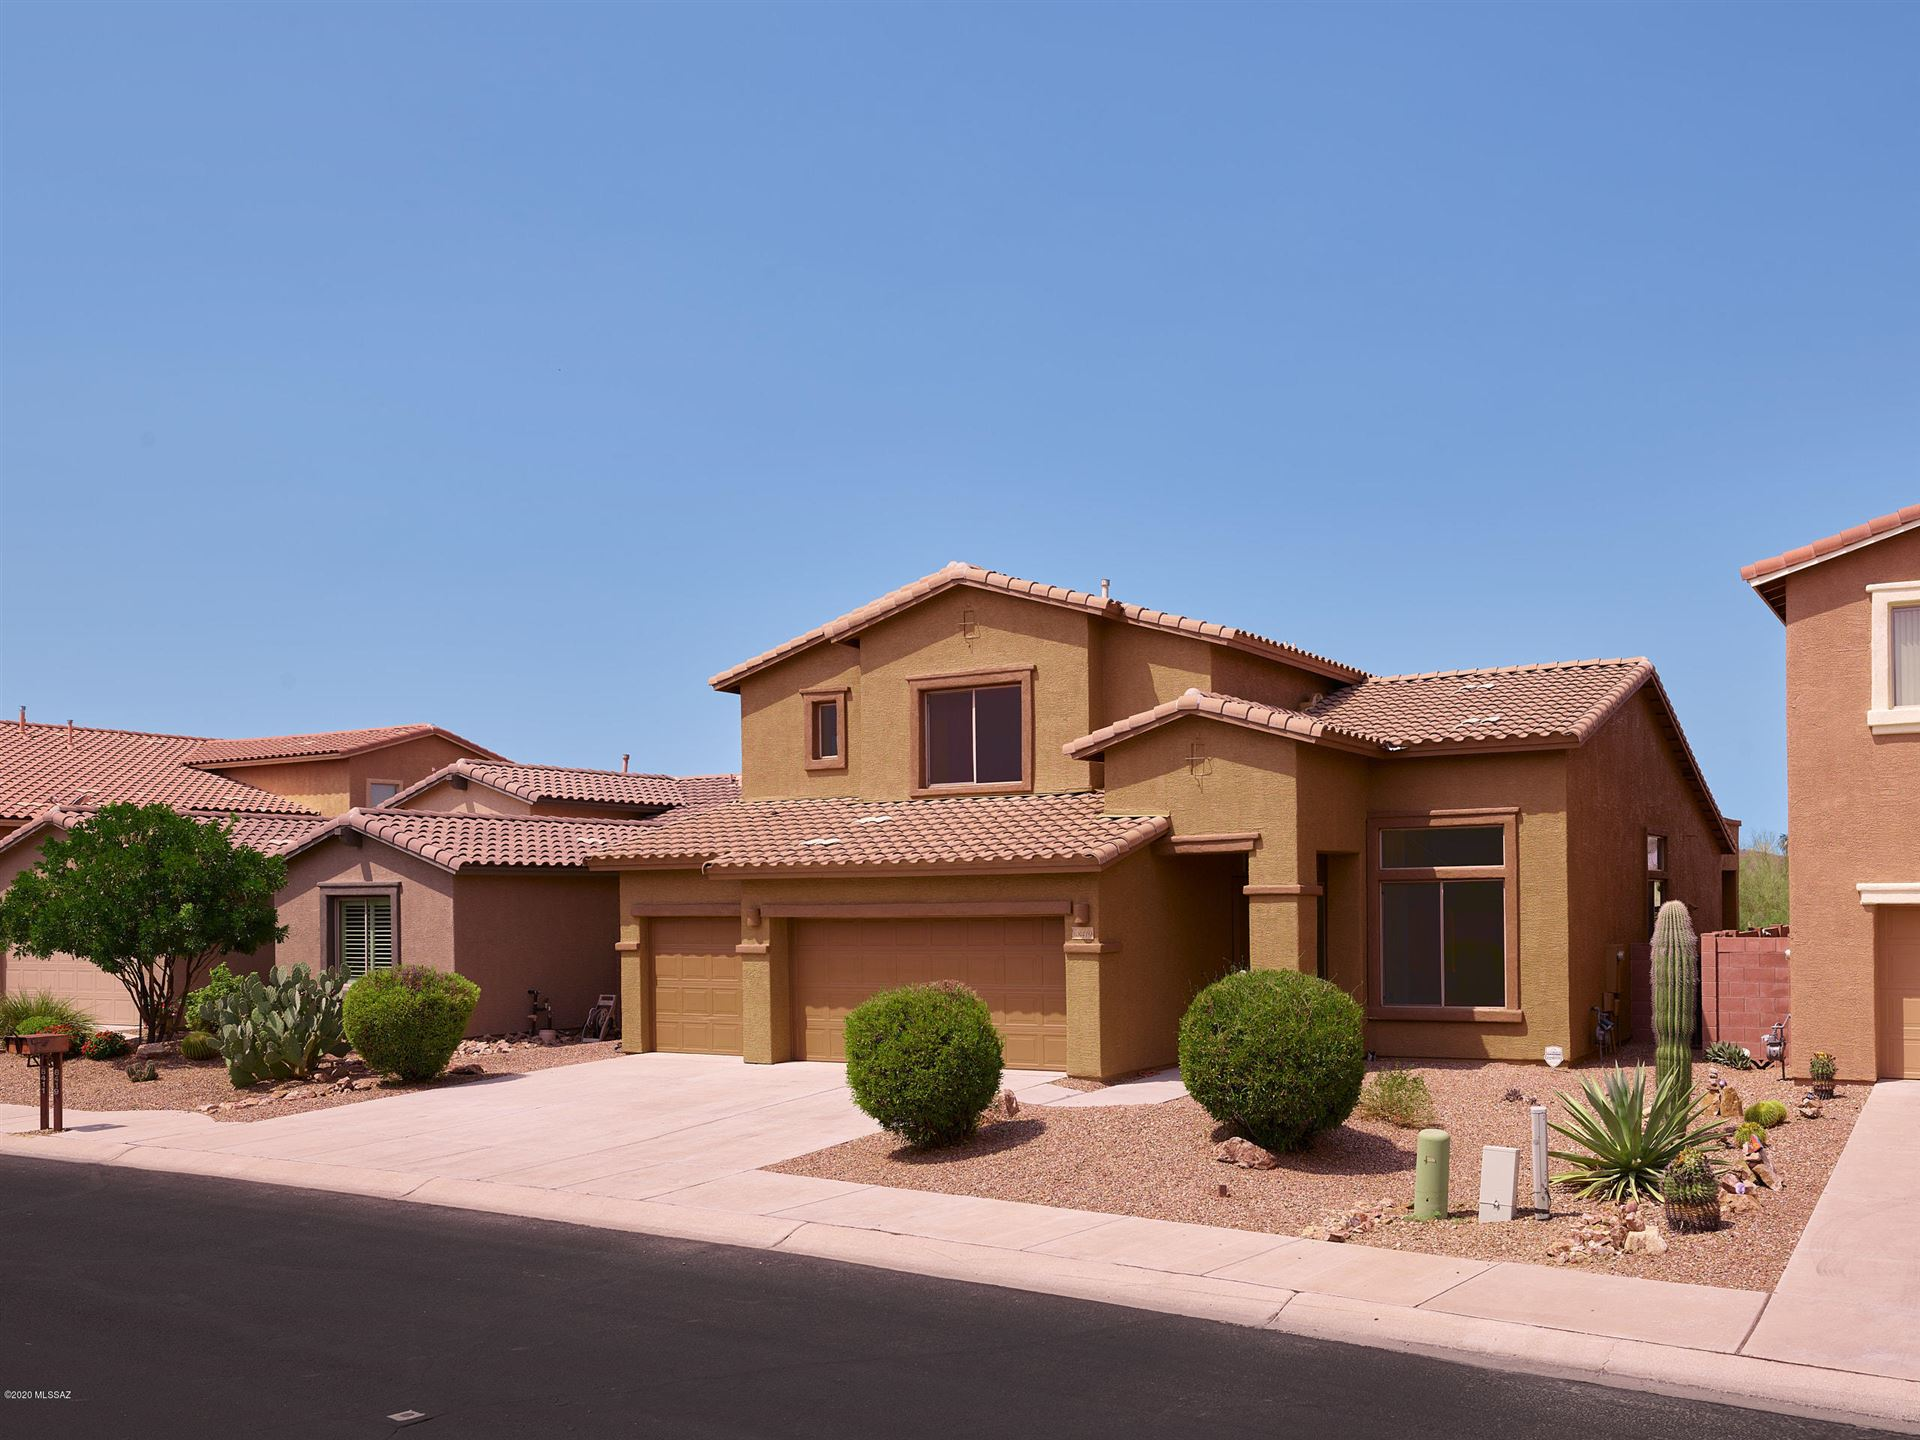 8419 N Amber Burst Drive, Marana, AZ 85743 - #: 22021085